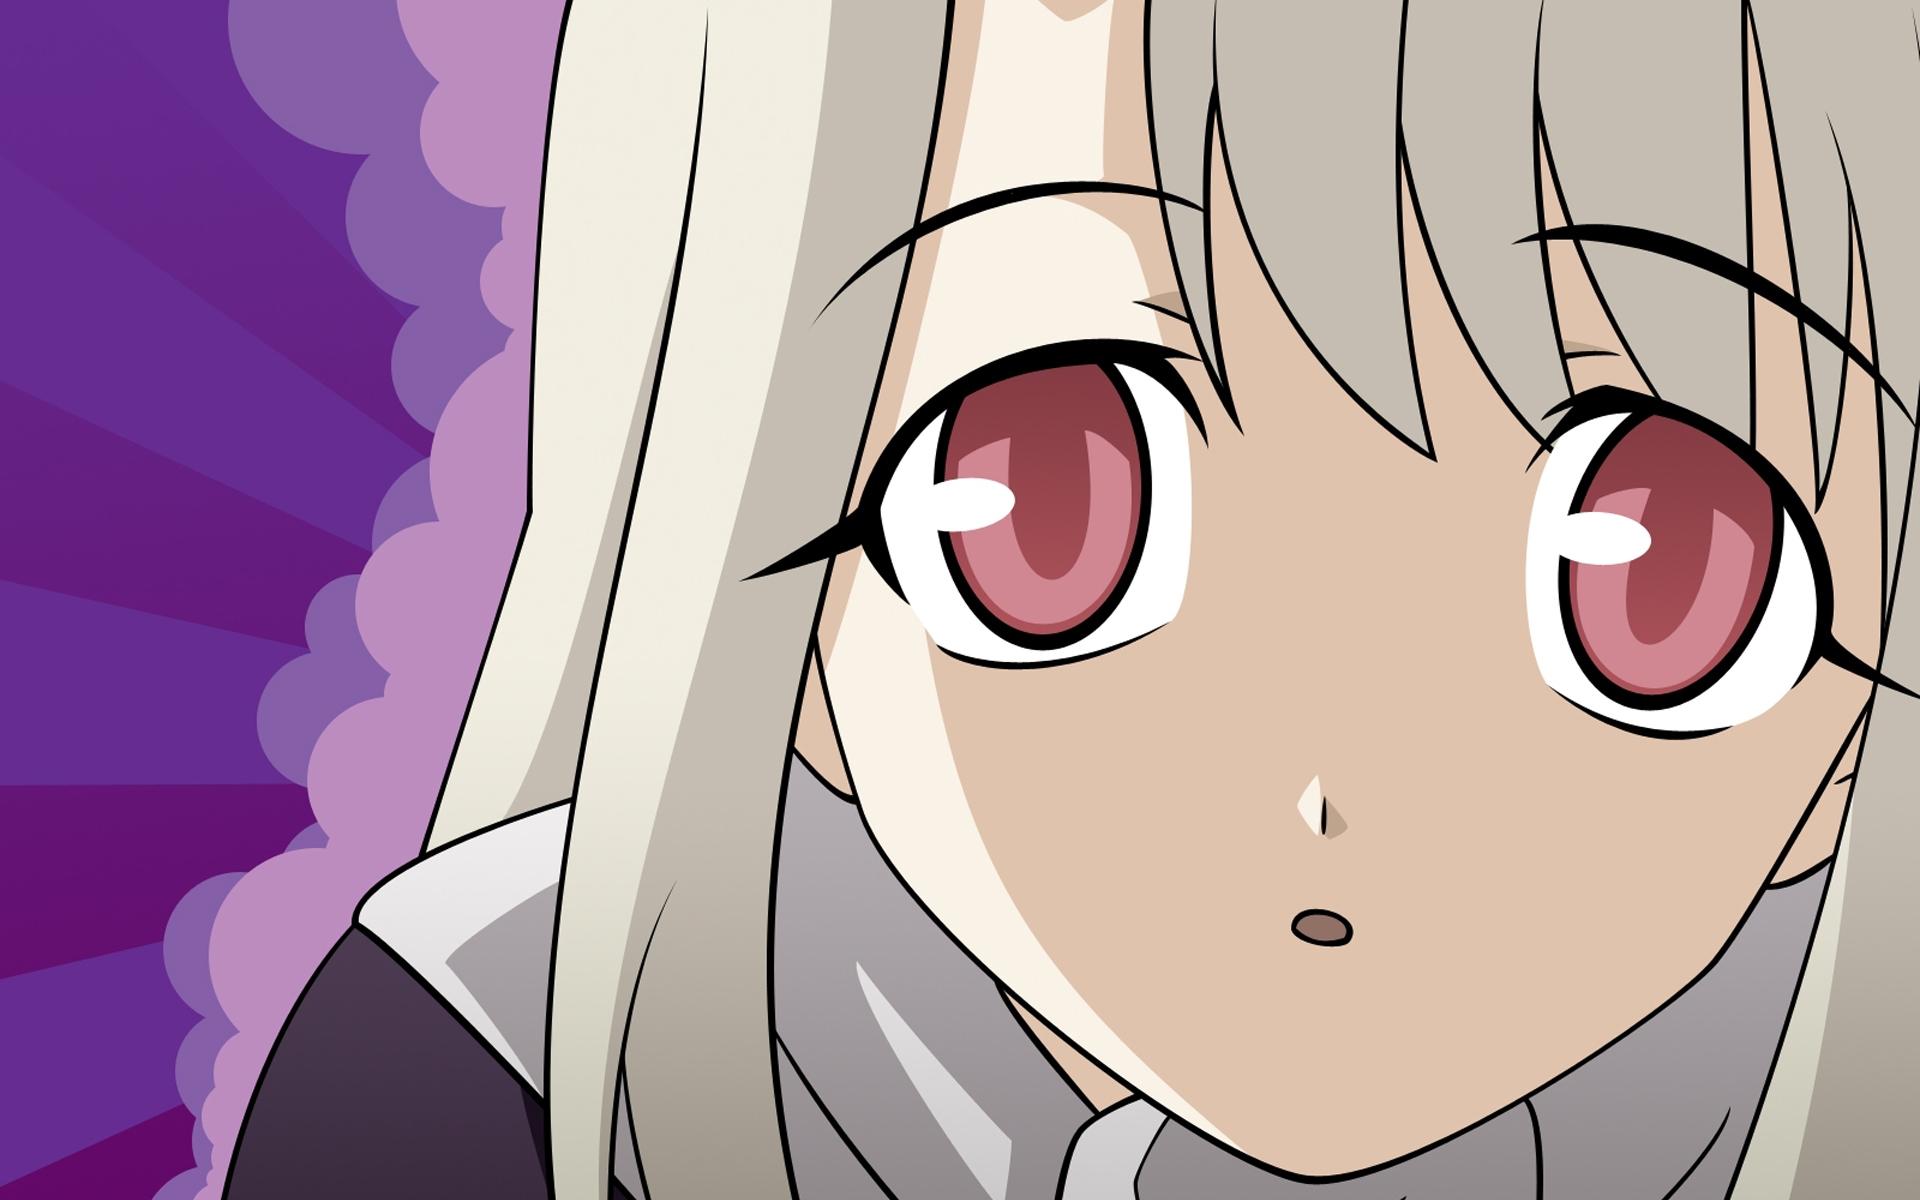 Картинки аниме девушек без эмоций